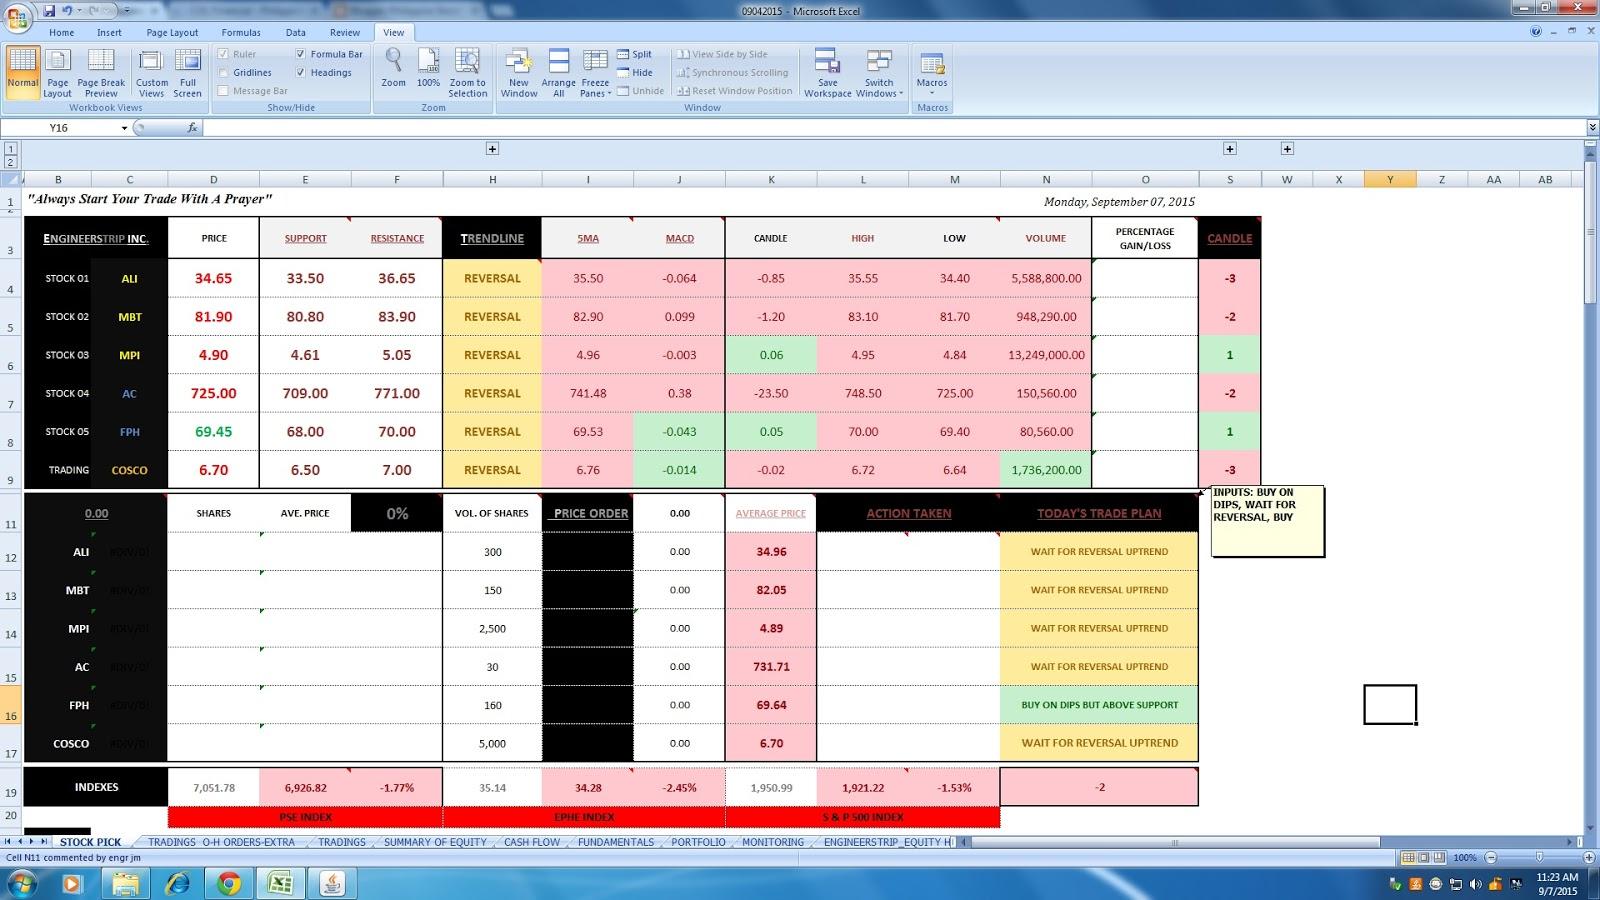 Philippine Stock Market Online Trading